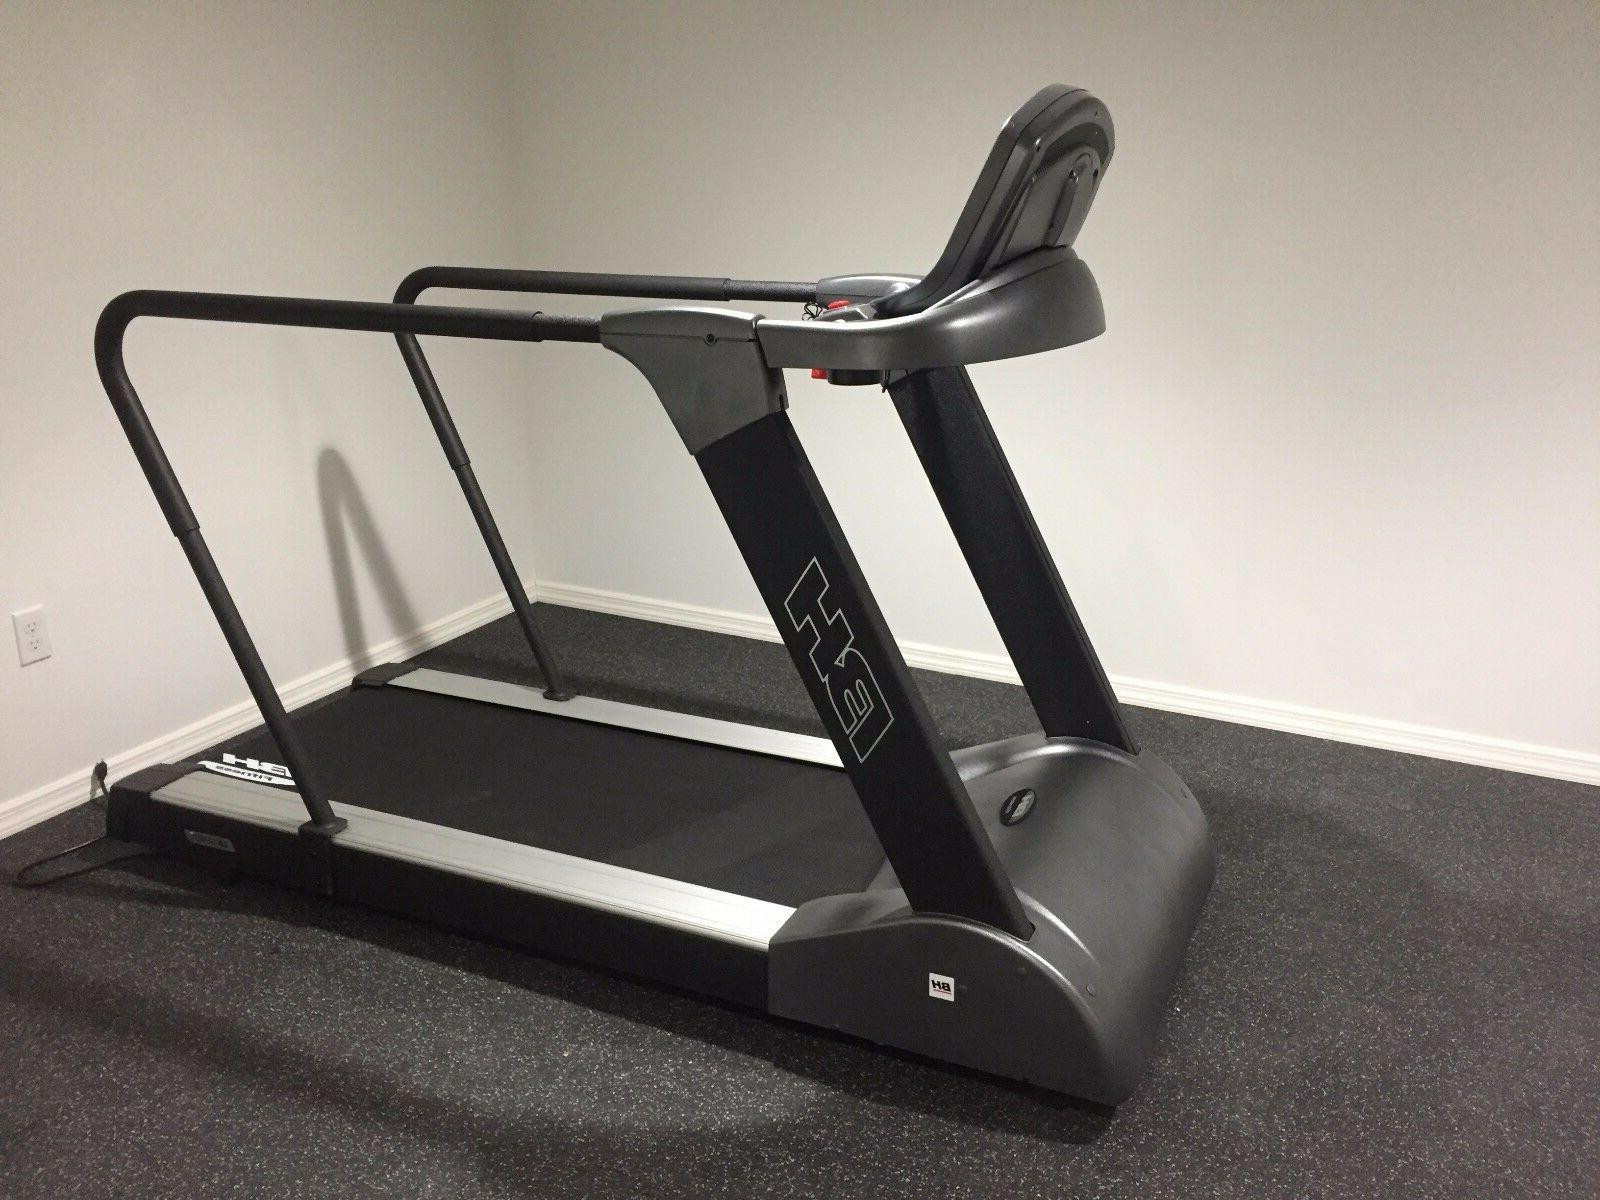 lk t8 treadmill with medical rails